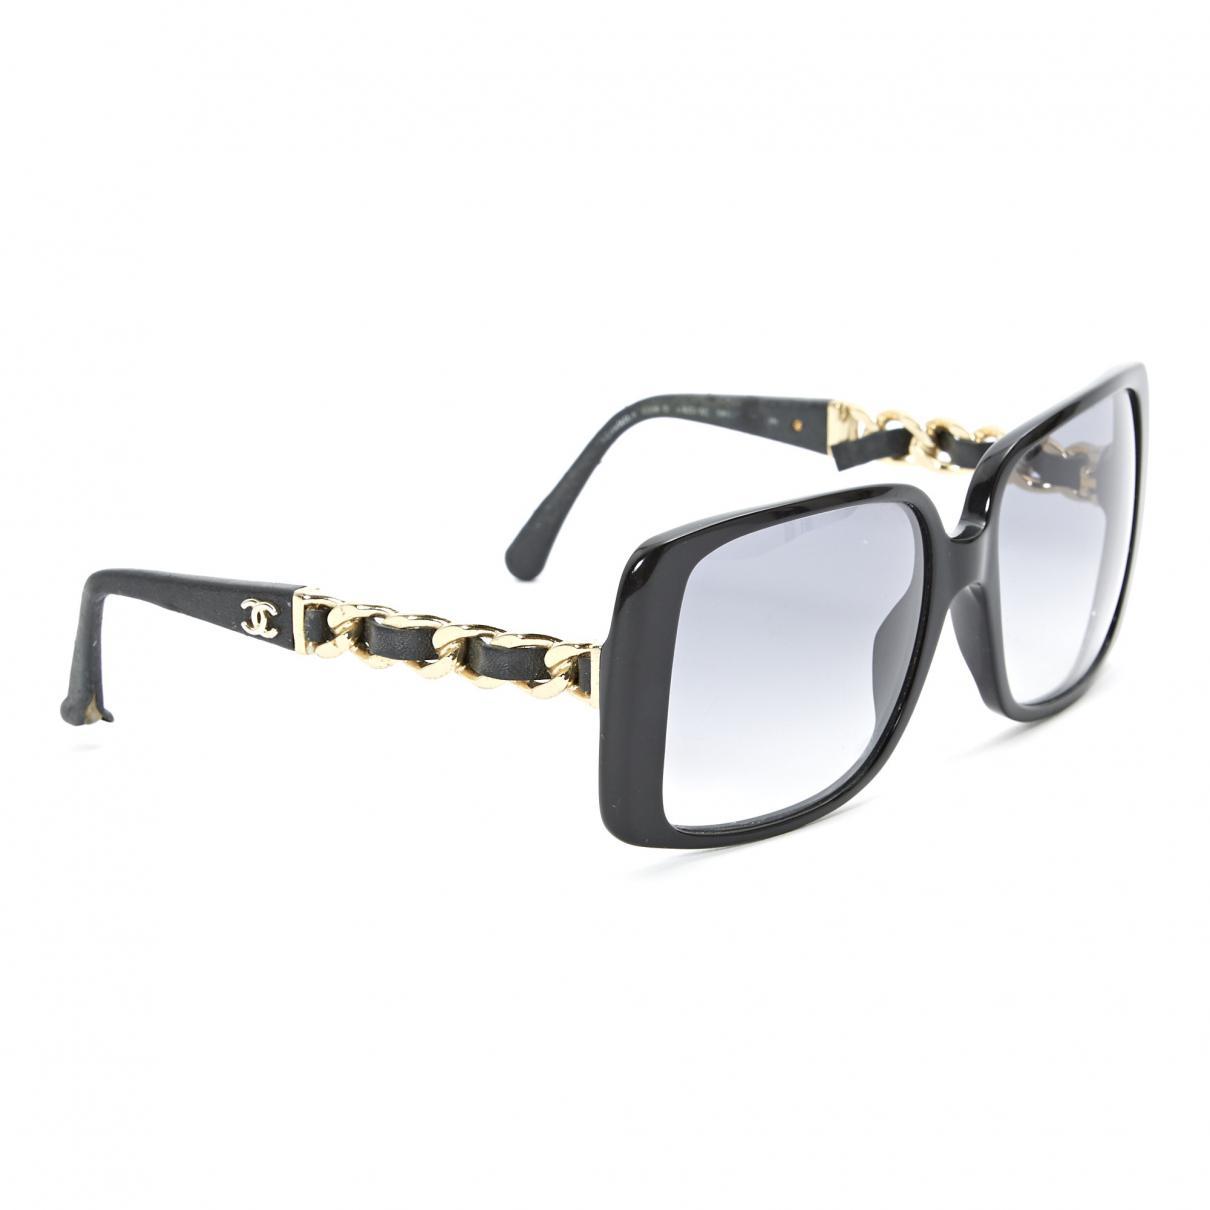 301ace4615 Lyst - Chanel Black Plastic Sunglasses in Black